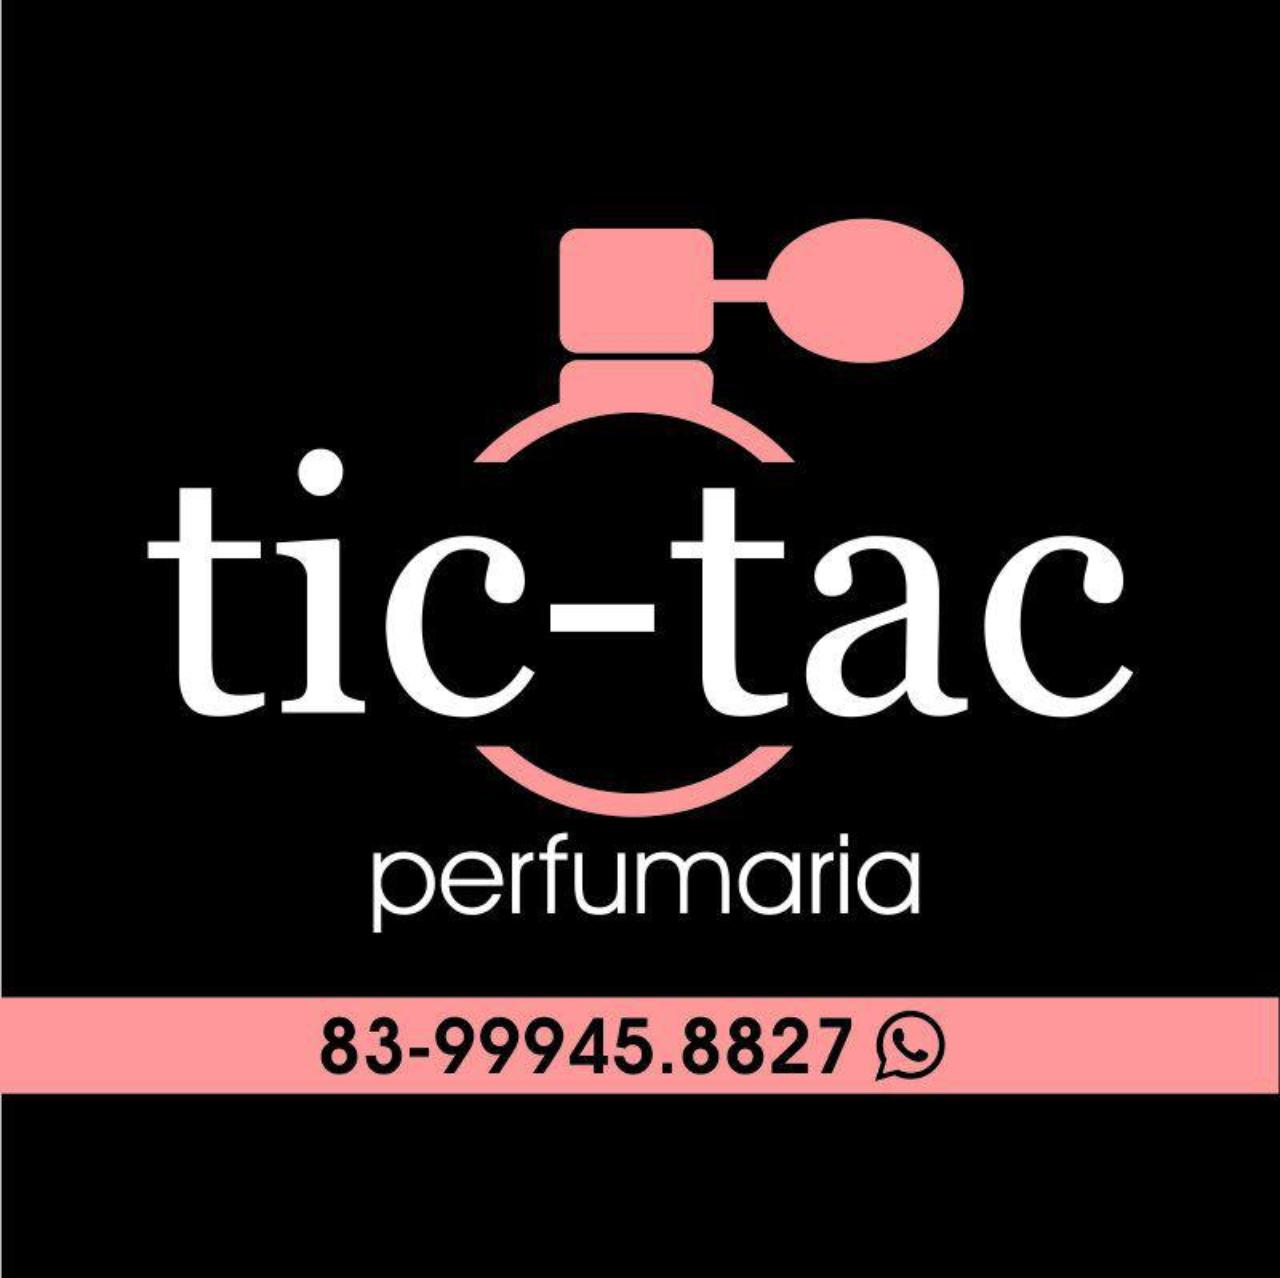 Tic Tac Perfumaria